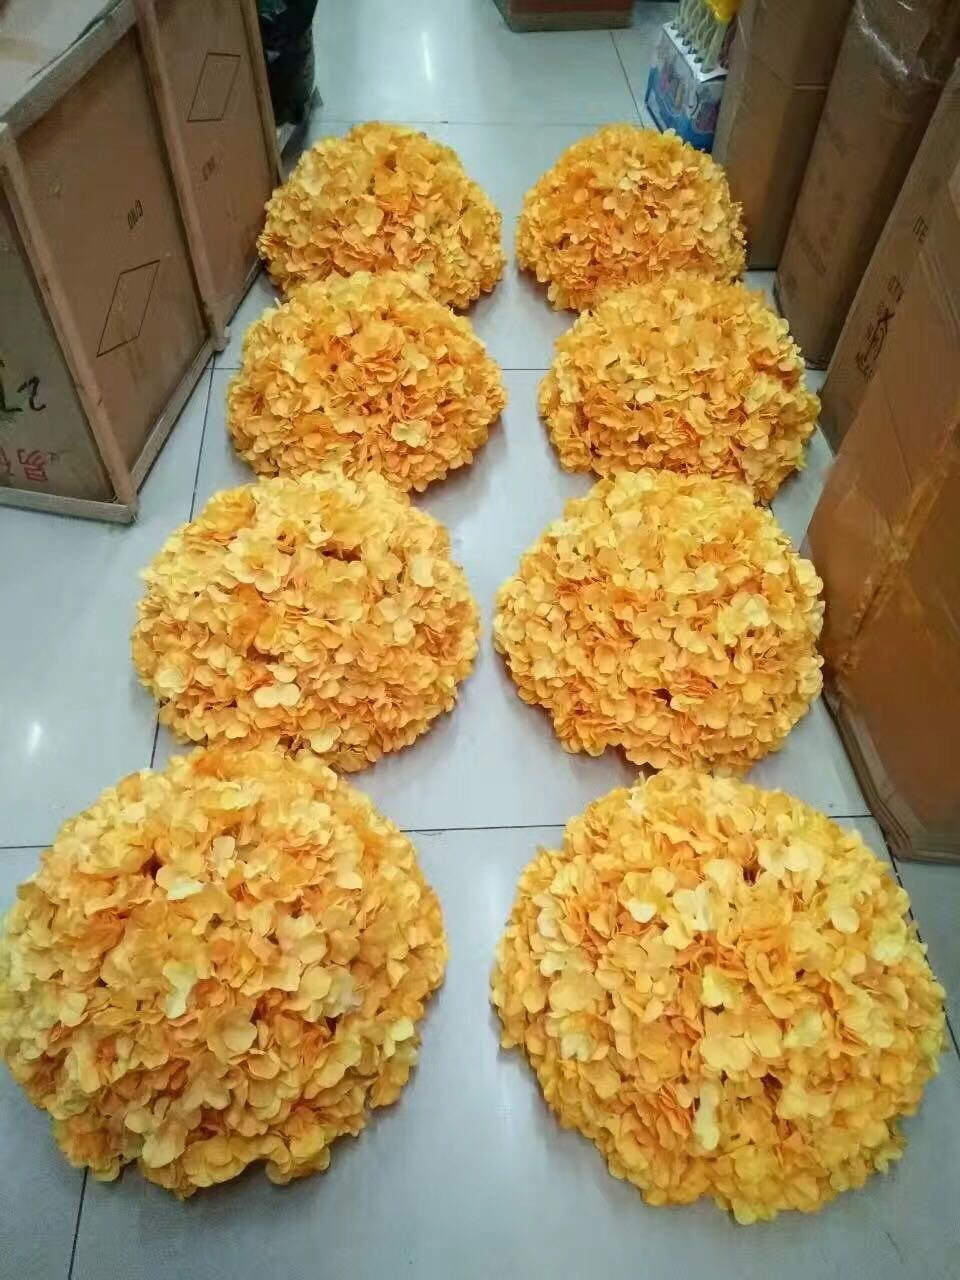 8 pcs custom wedding decorative flower arrangement table flower balls DIY packs include orange hydrangea heads and half balls